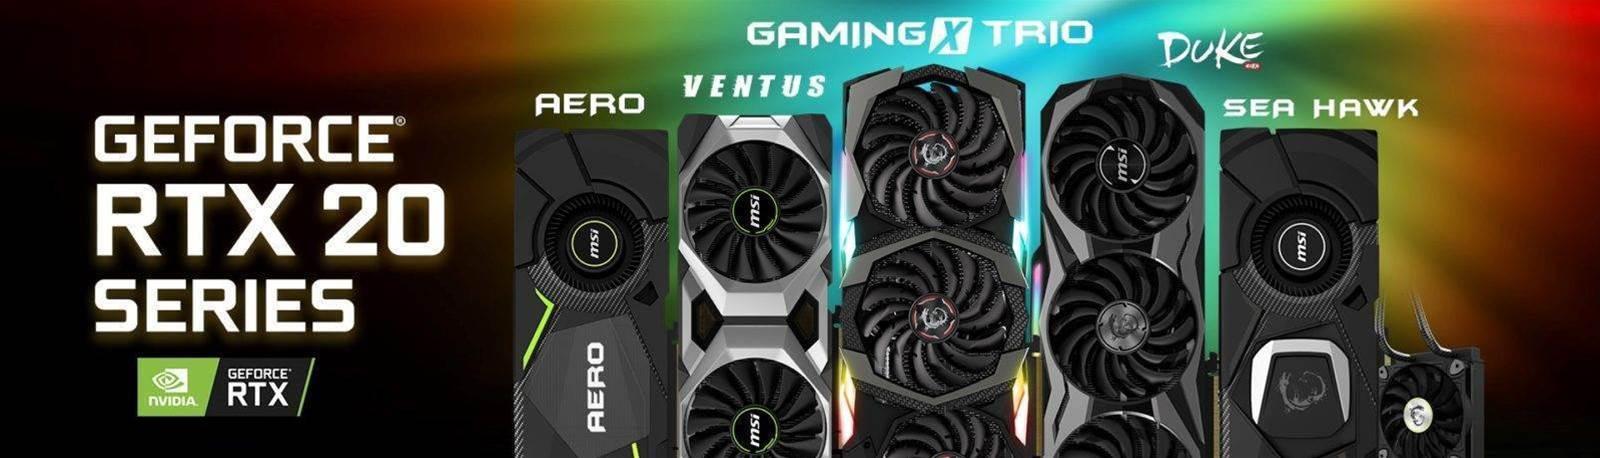 MSI spoils Nvidia's big reveal of the RTX 2080